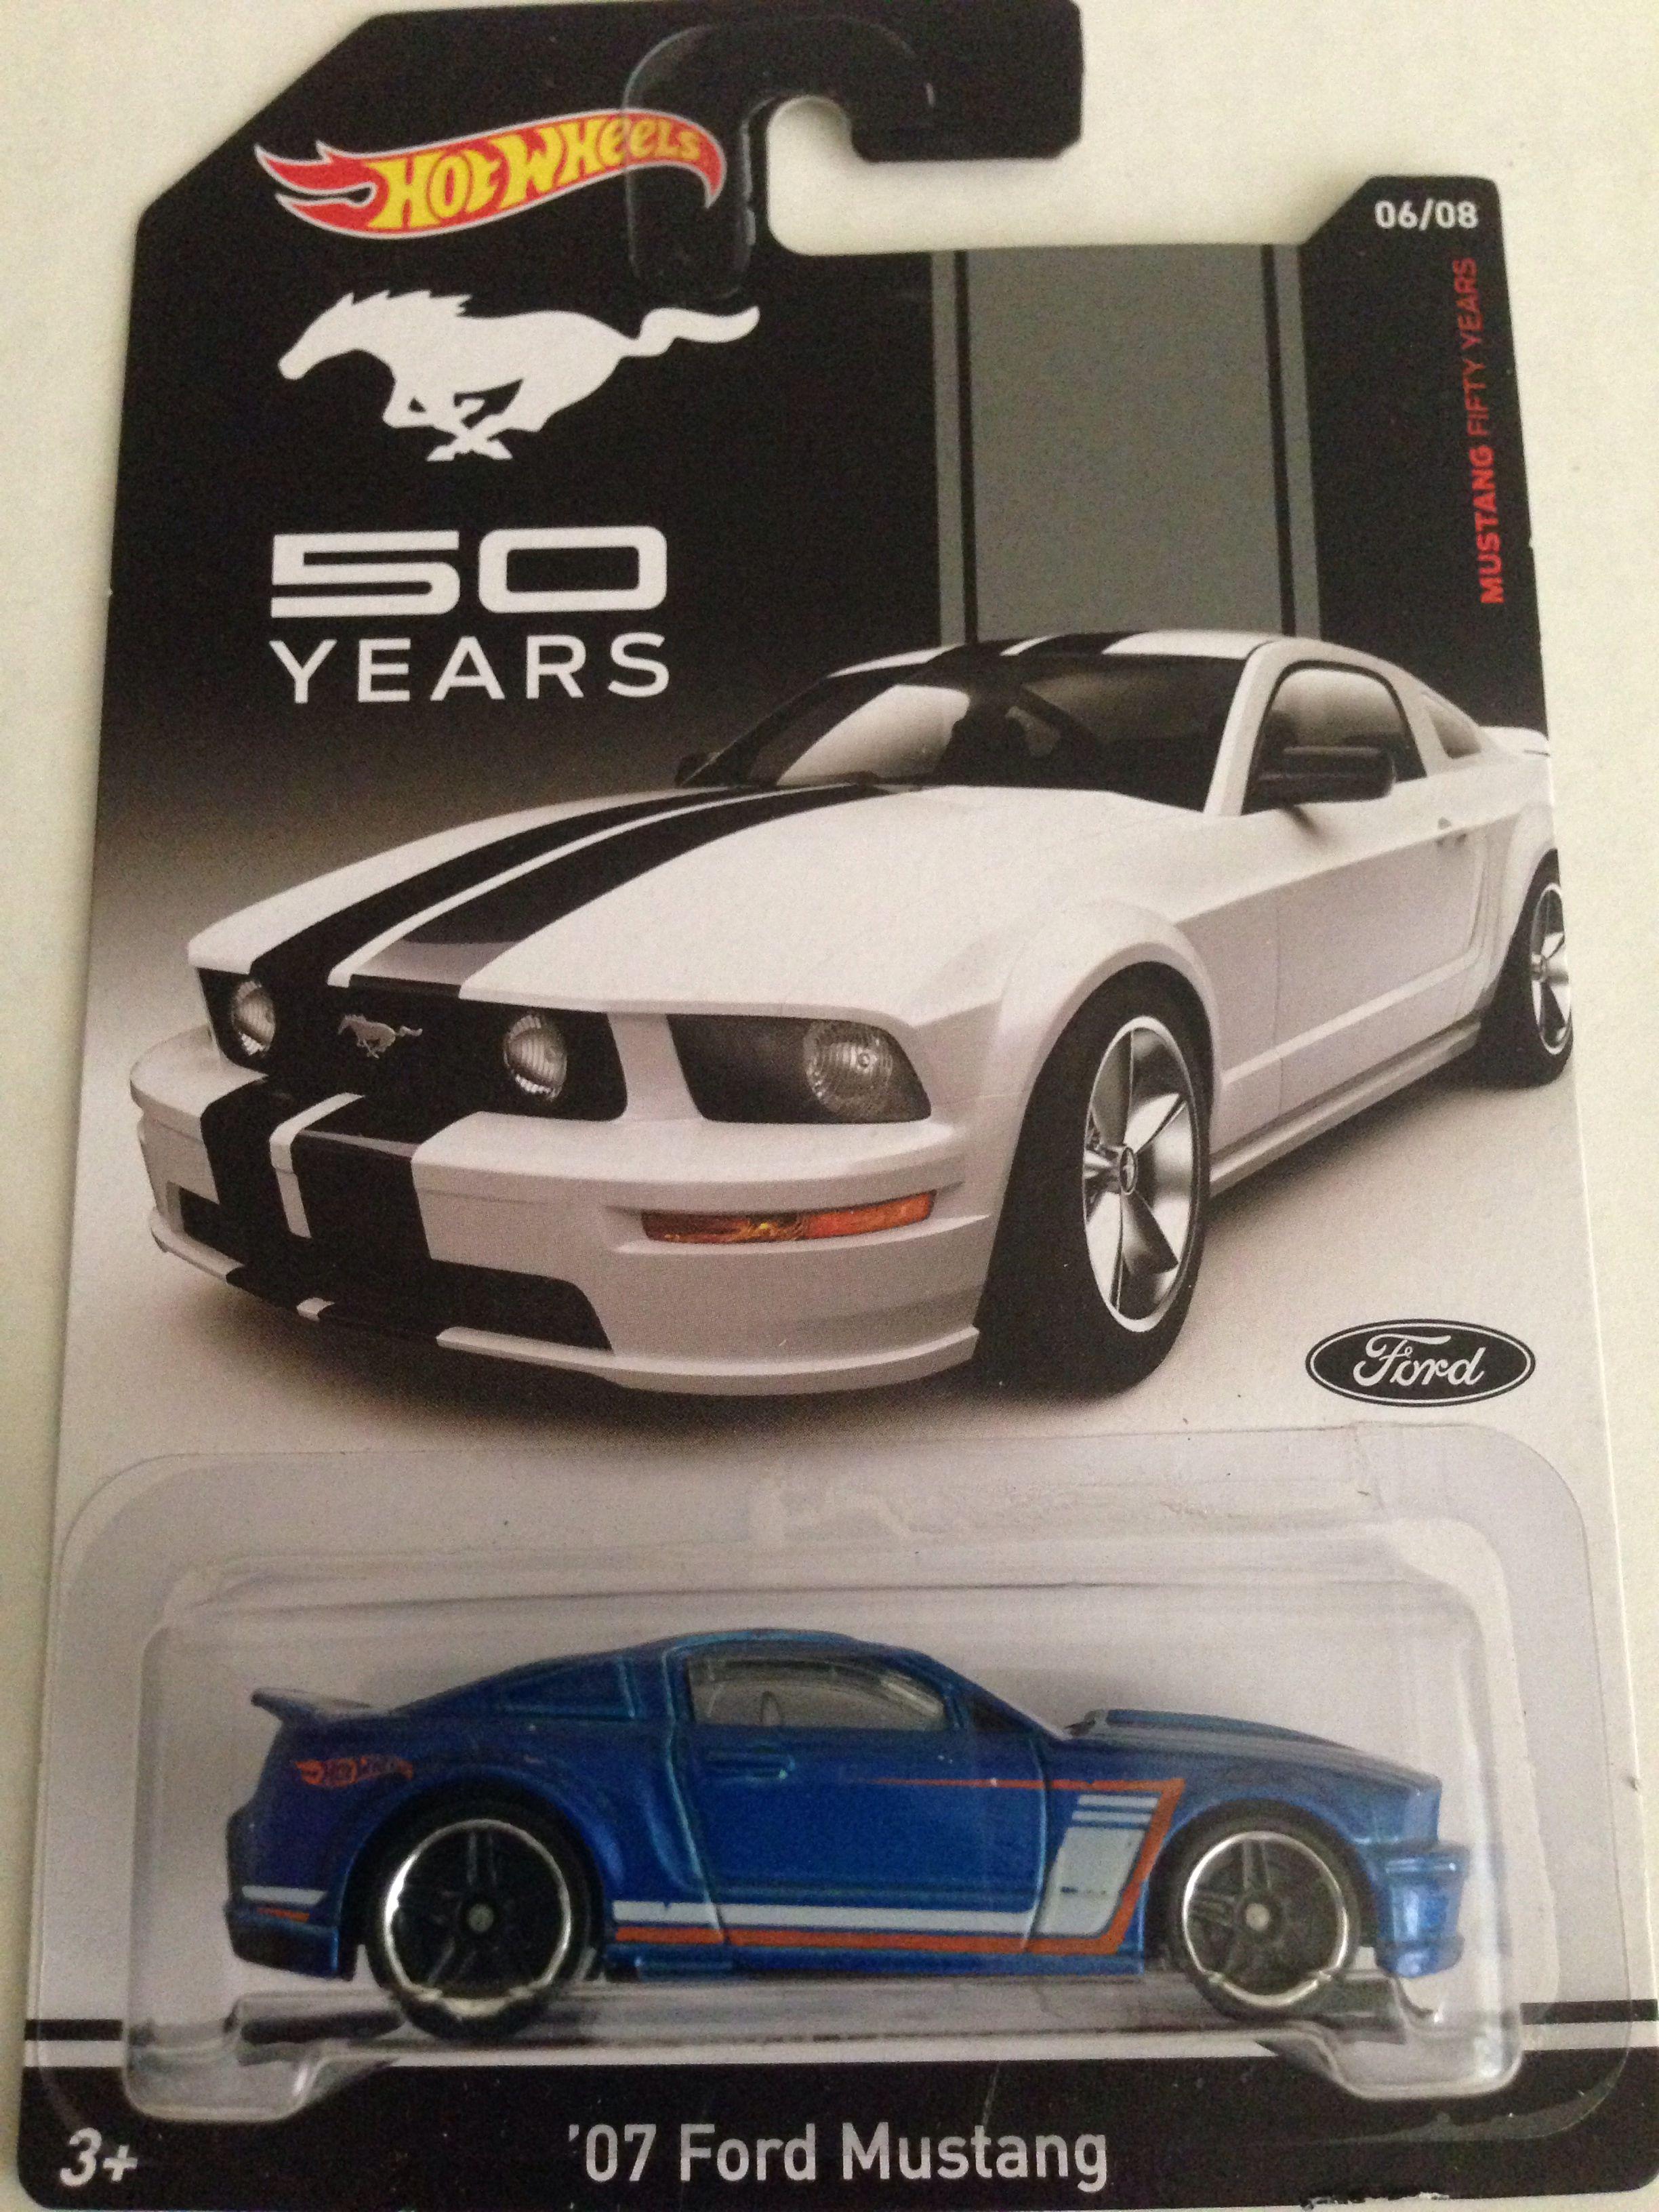 07 Ford Mustang Hot Wheels 2014 Mustang 50 Years 6 8 Hot